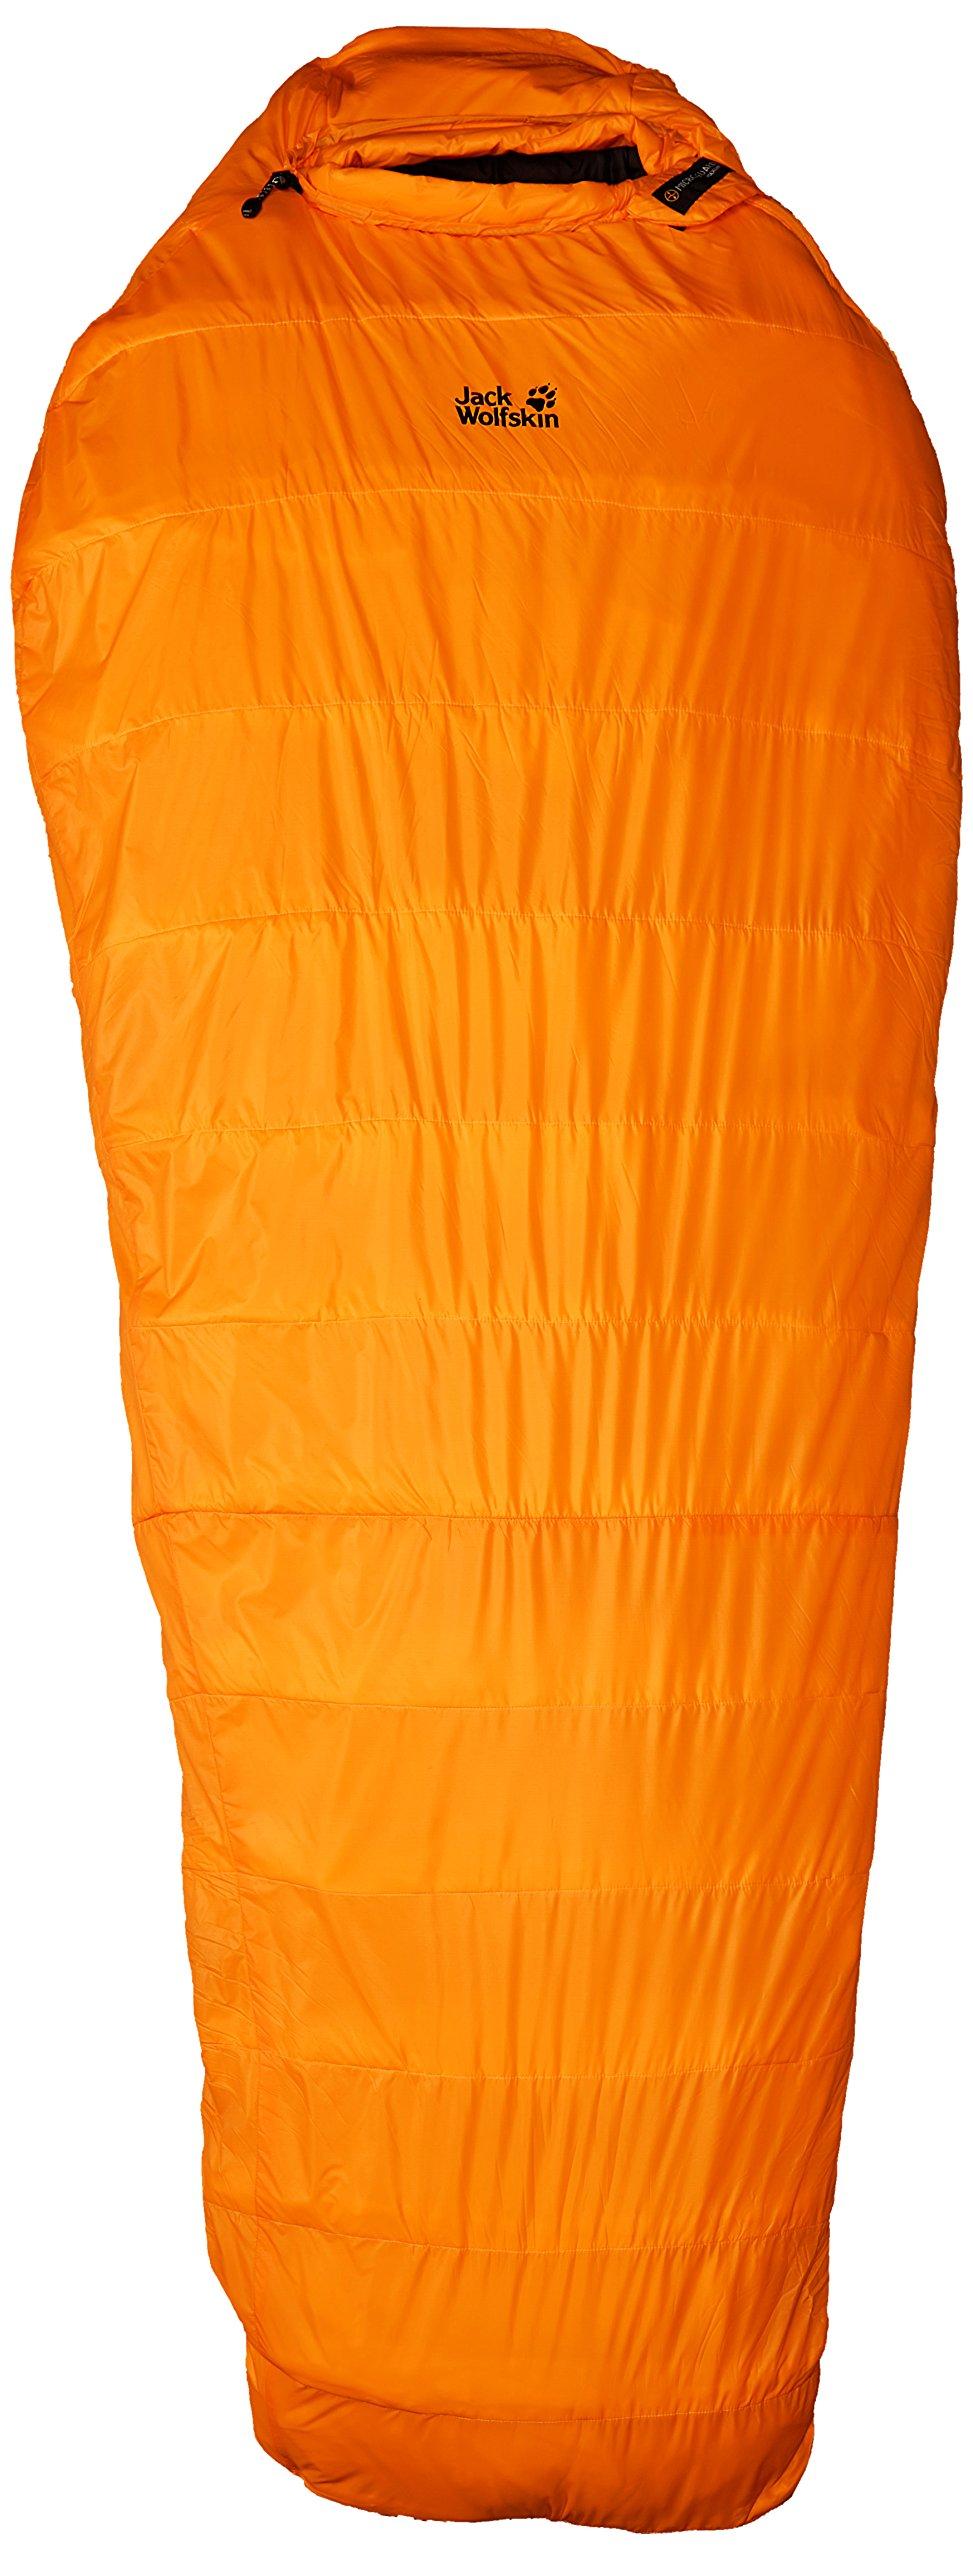 Jack Wolfskin Base Camp -29 Degrees Celcius Sleeping Bag, Bag /Burly Yellow by Jack Wolfskin